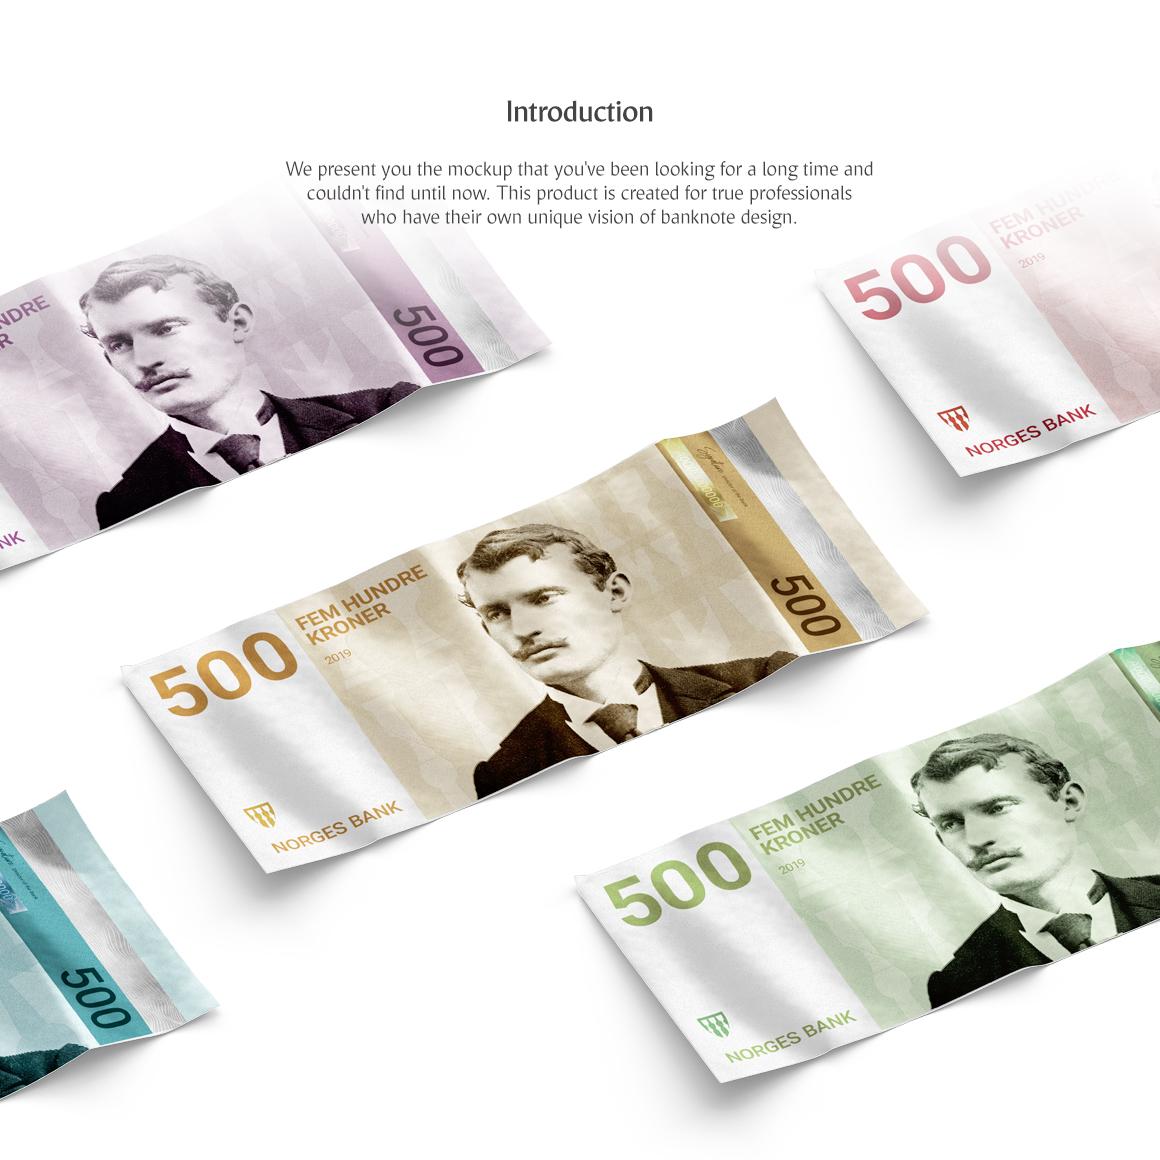 Banknote Set Product Mockups